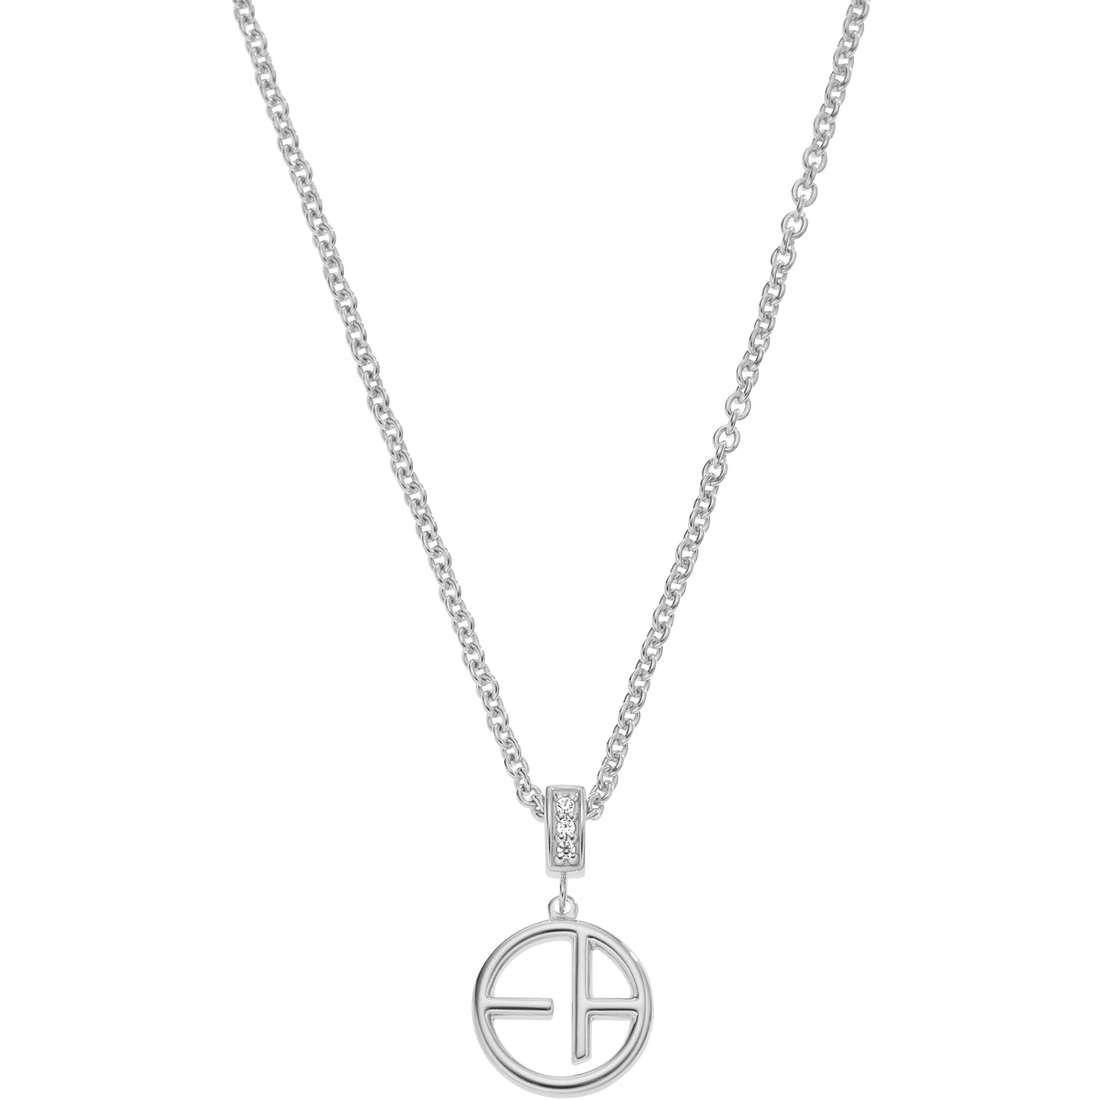 necklace woman jewellery Emporio Armani EG3195040